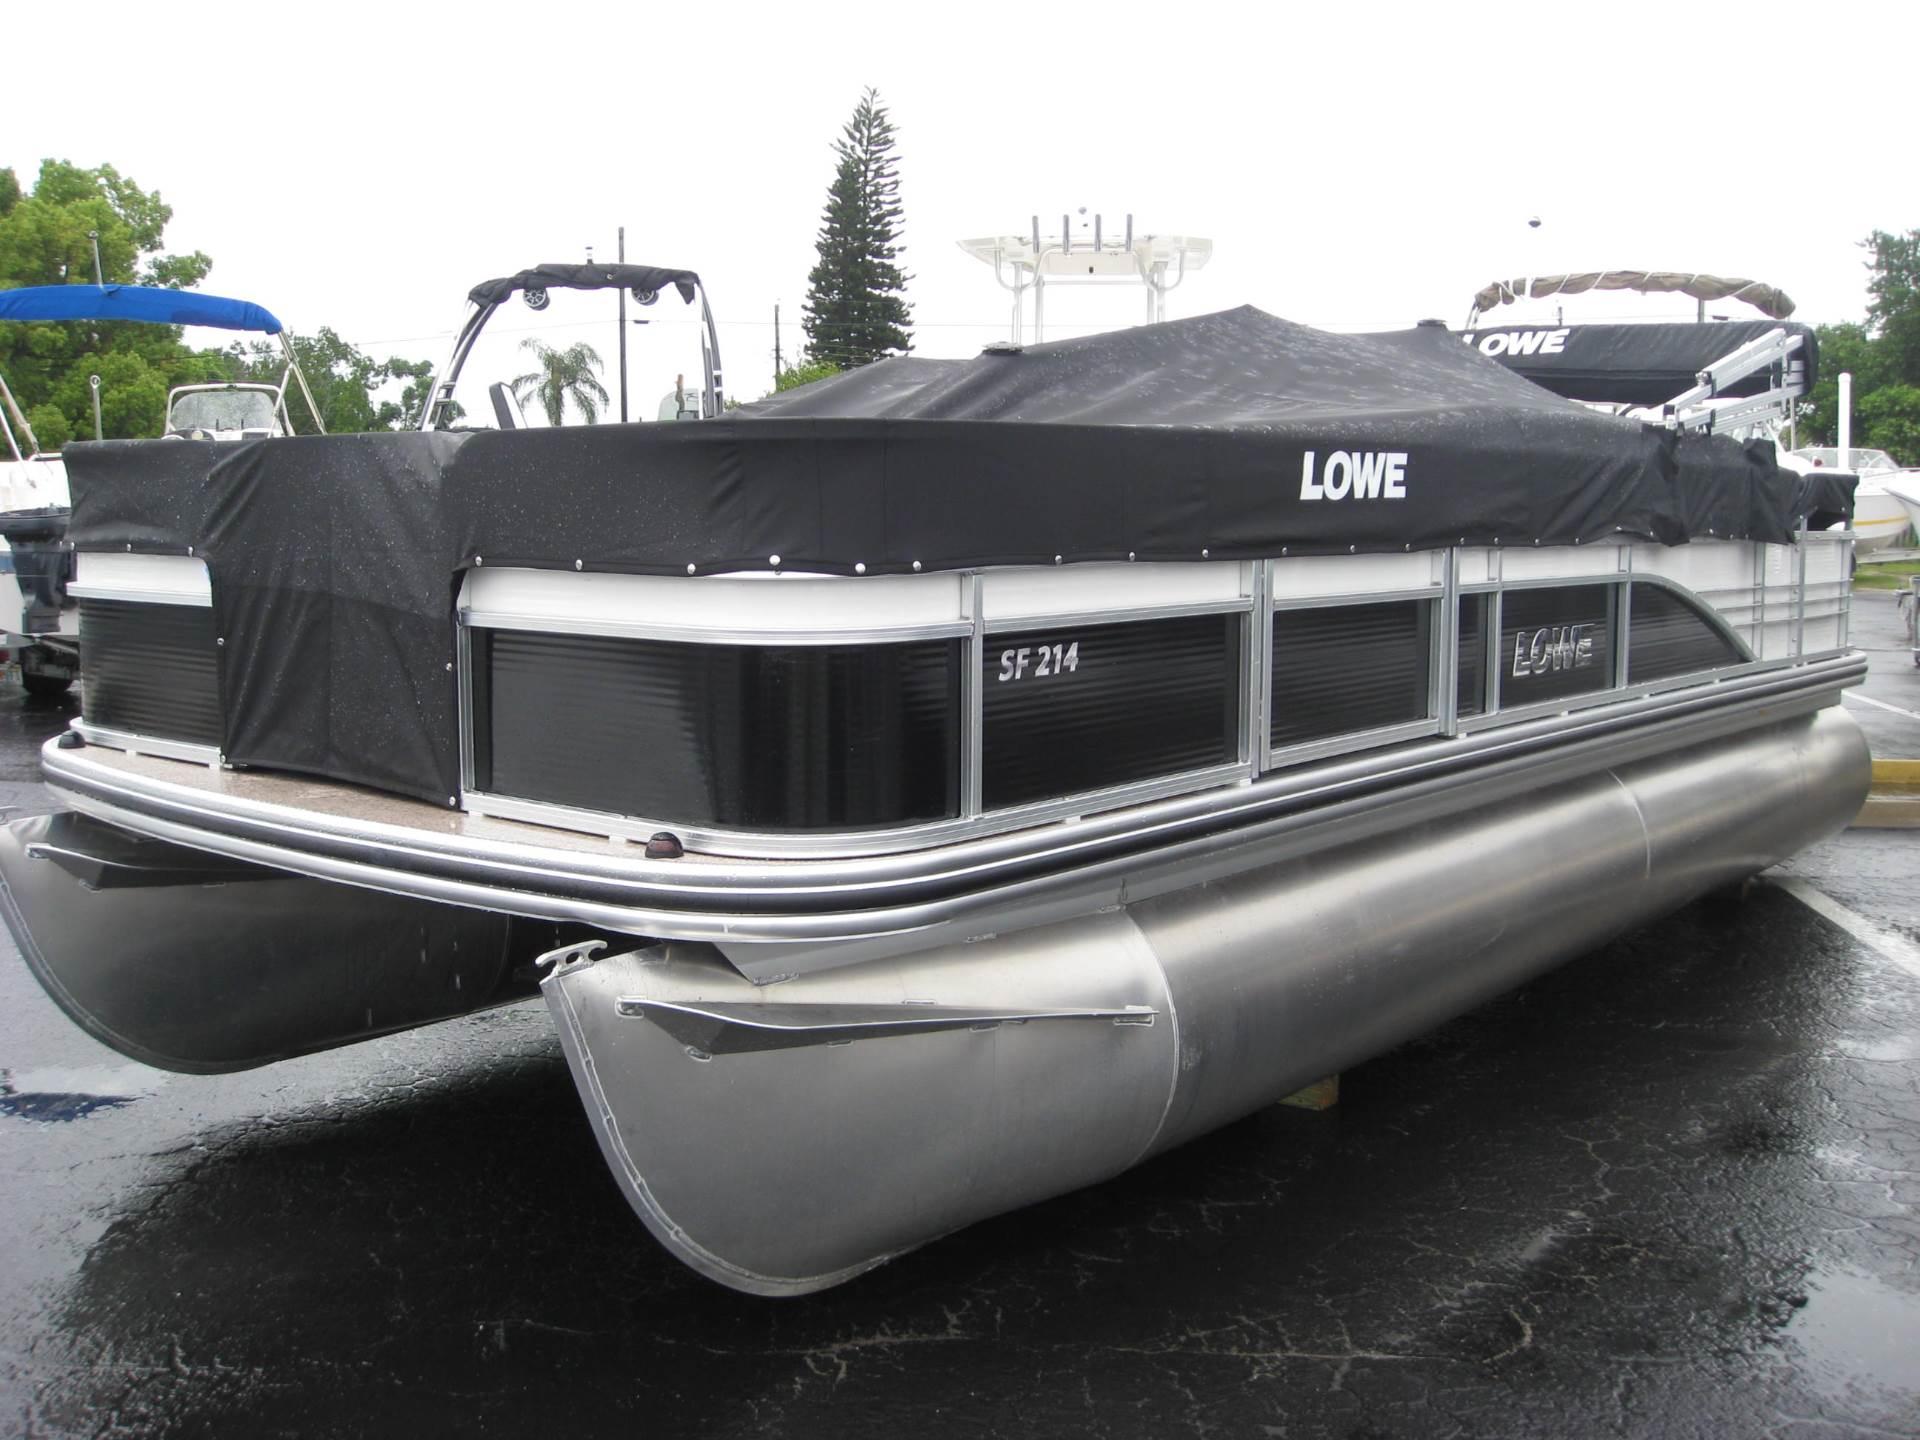 Lowe SF 214